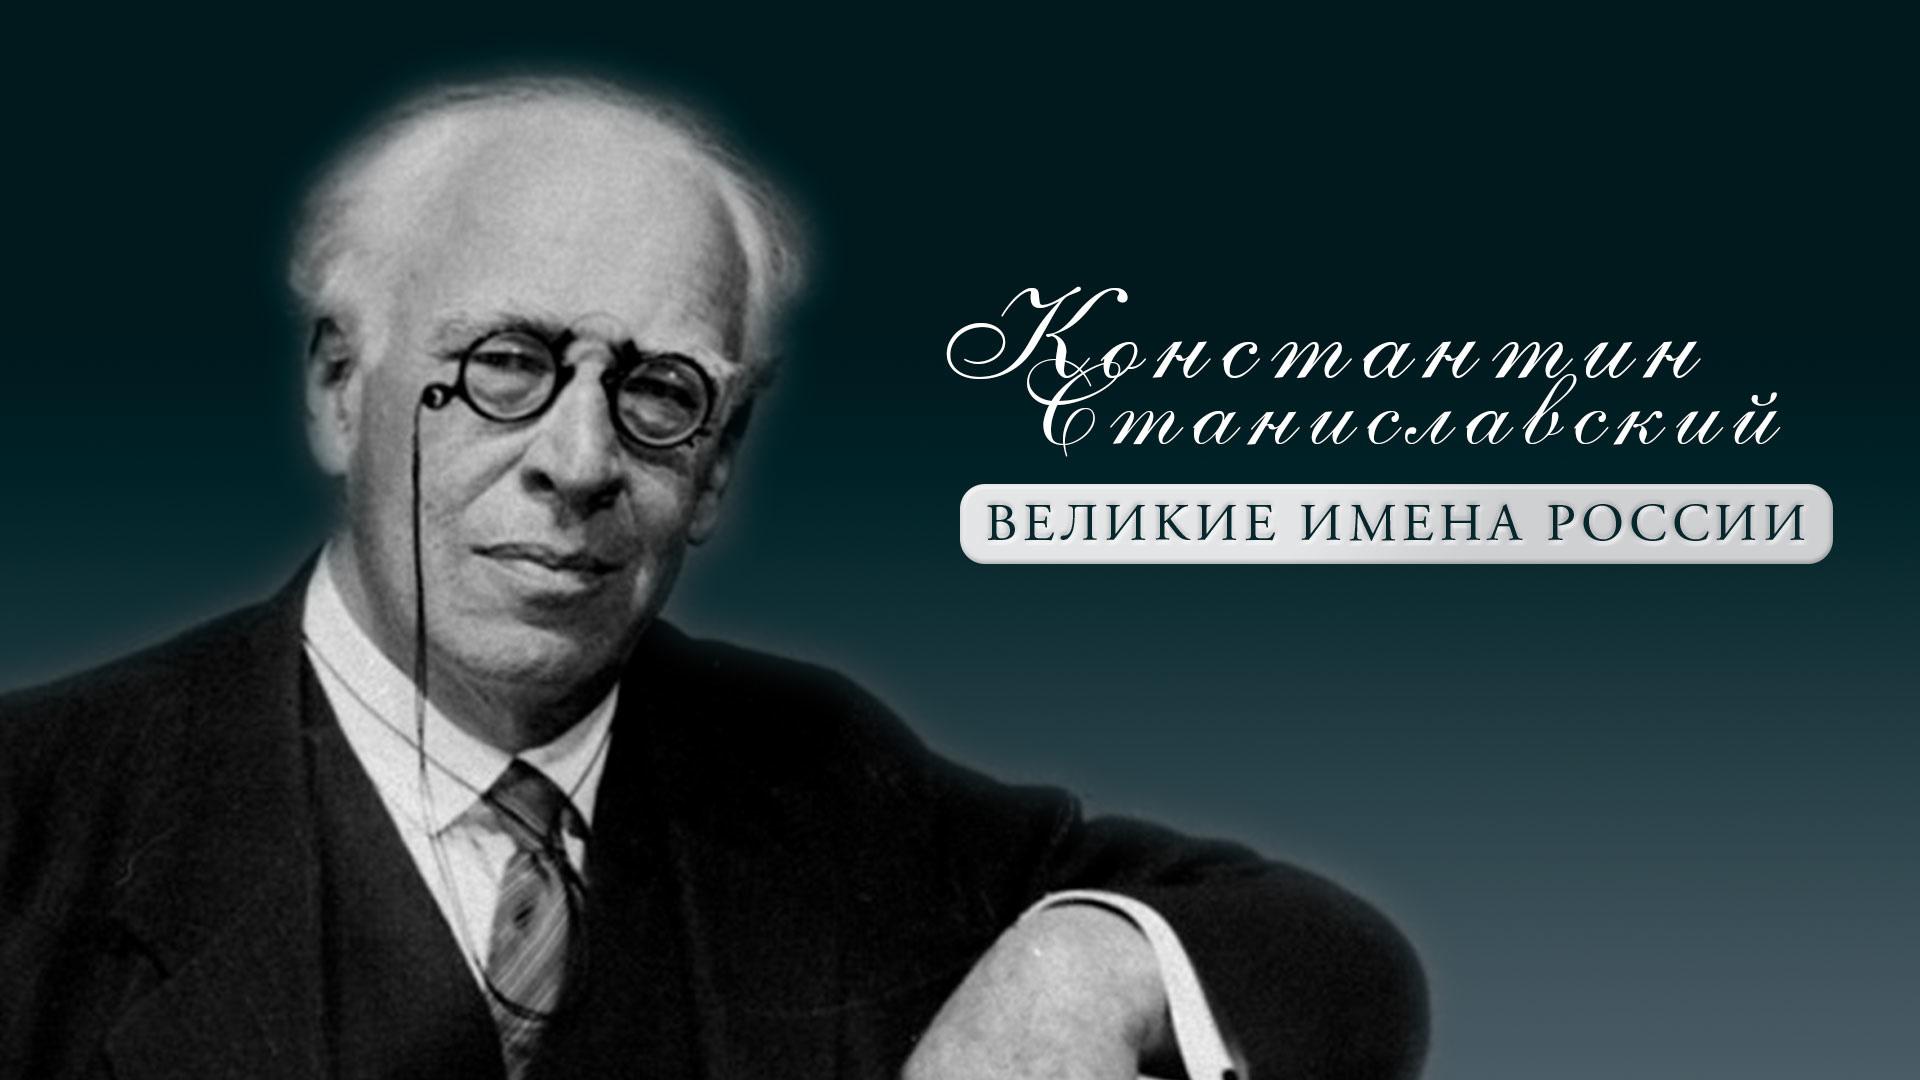 Константин Станиславский. Великие имена России